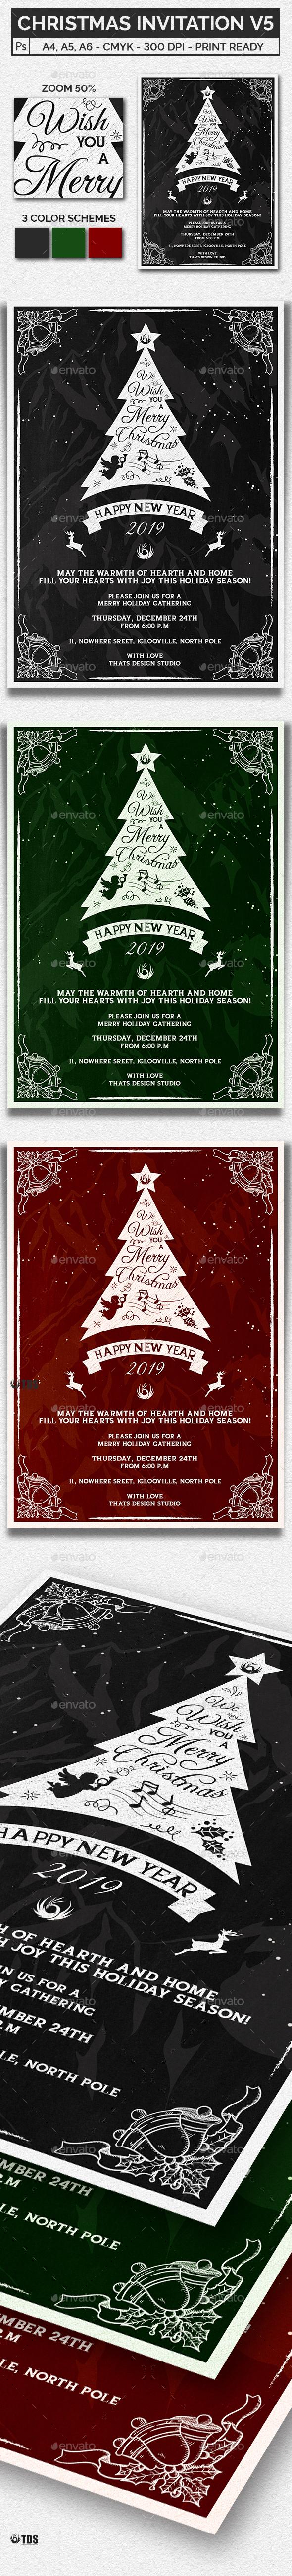 Christmas Invitation Template V5 - Invitations Cards & Invites